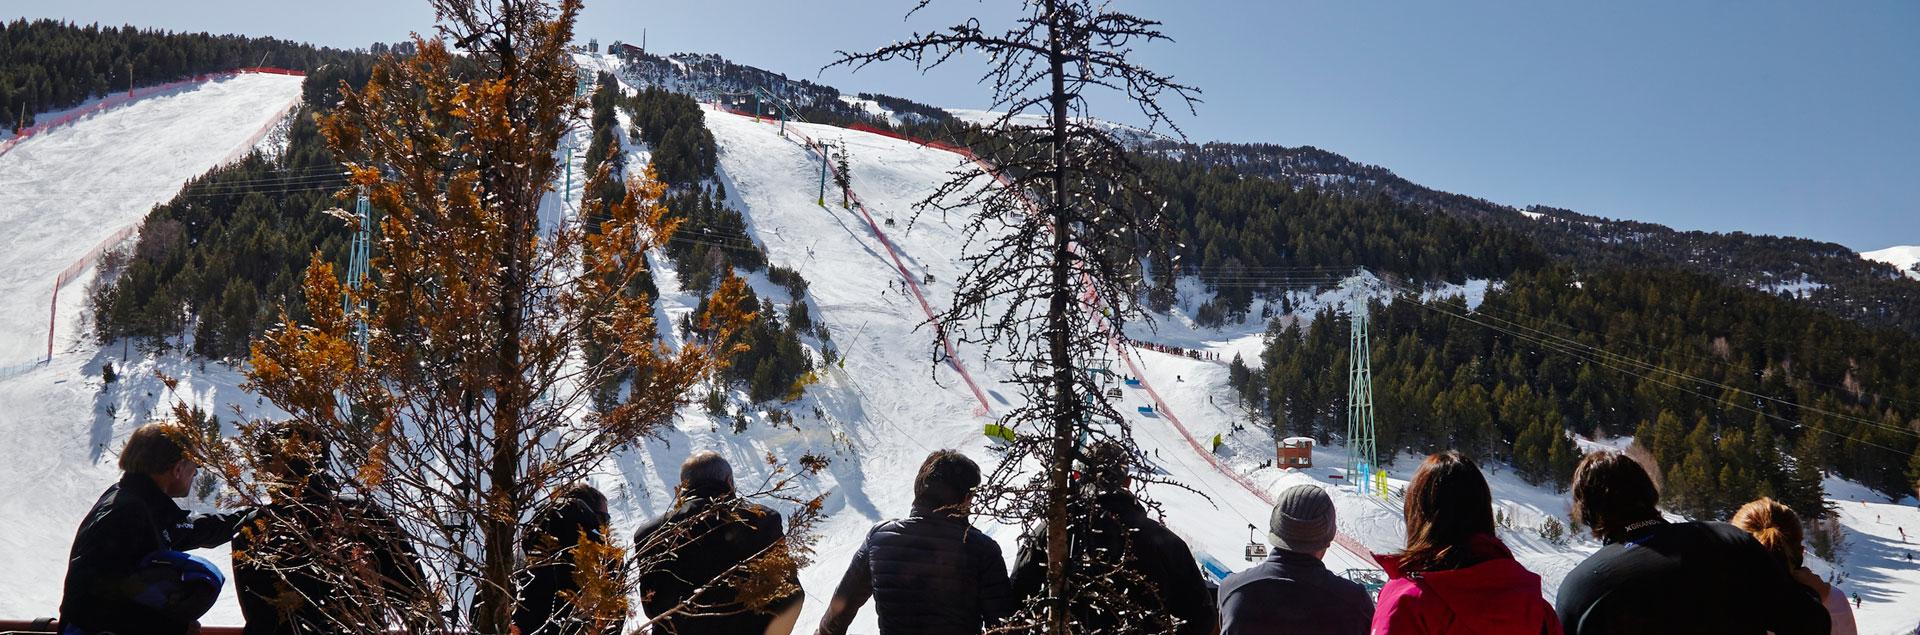 ski holiday   sport hotels andorra